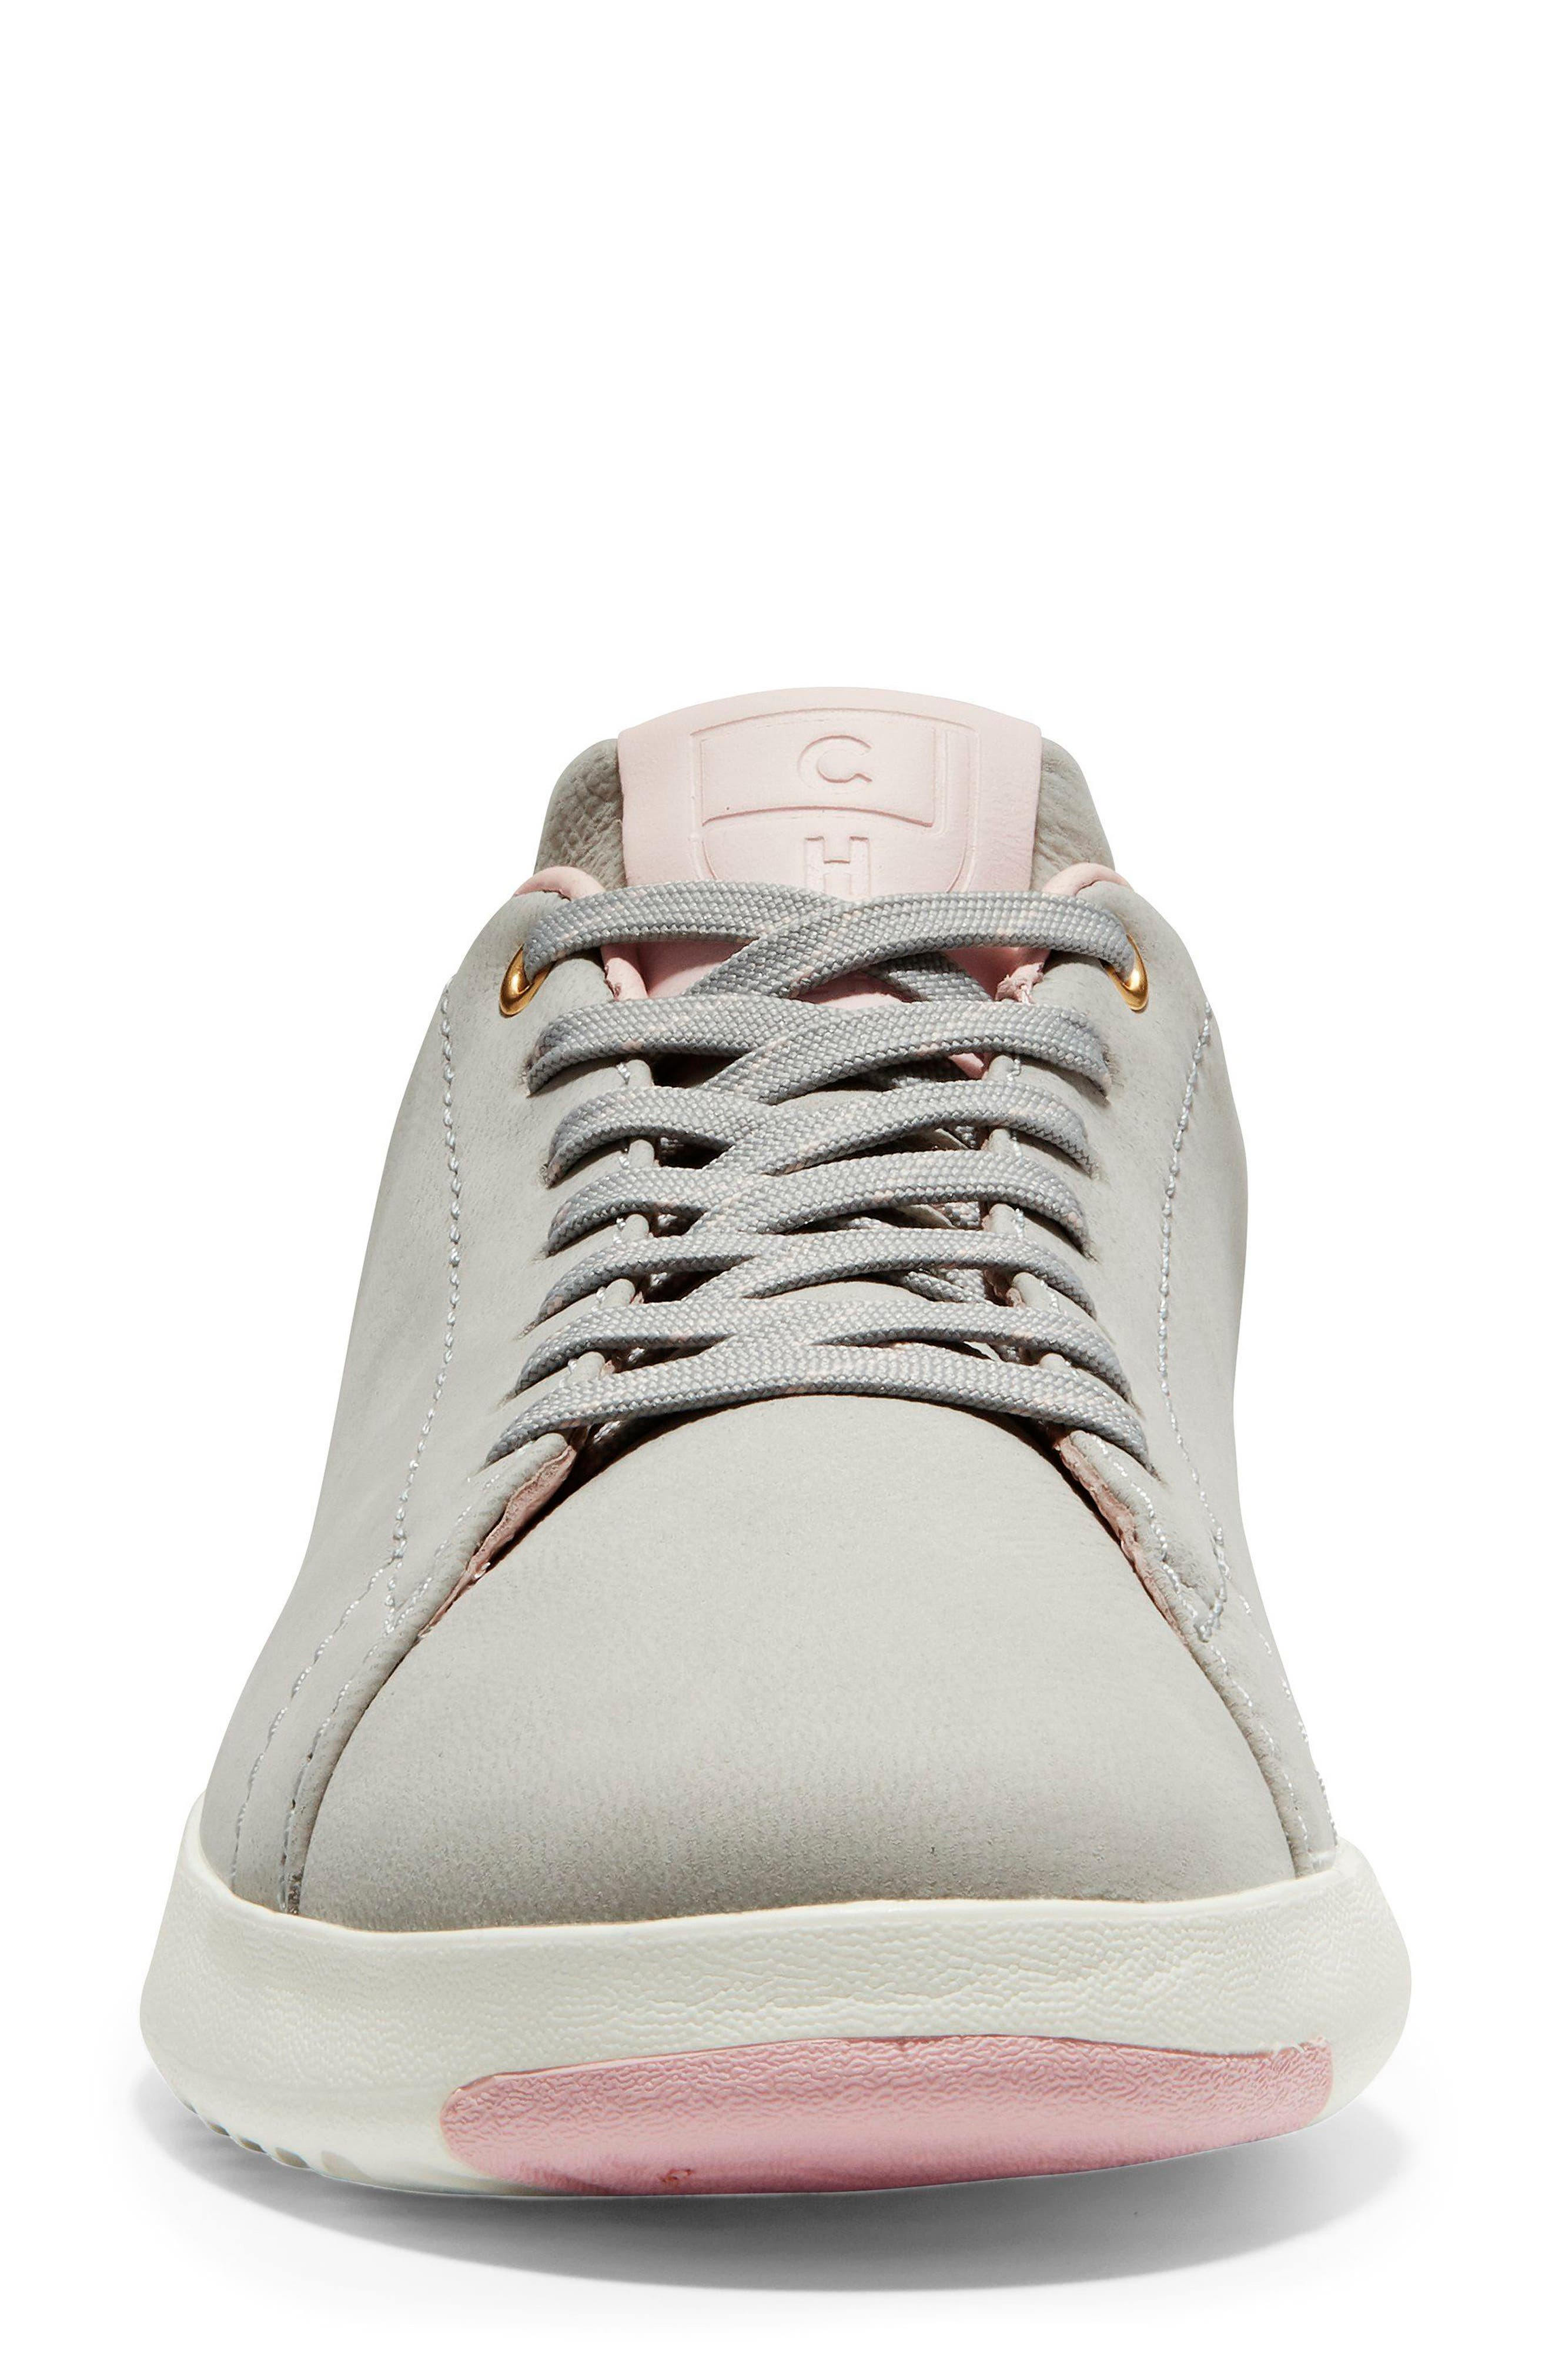 GrandPro Tennis Shoe,                             Alternate thumbnail 8, color,                             Vapor Grey Nubuck